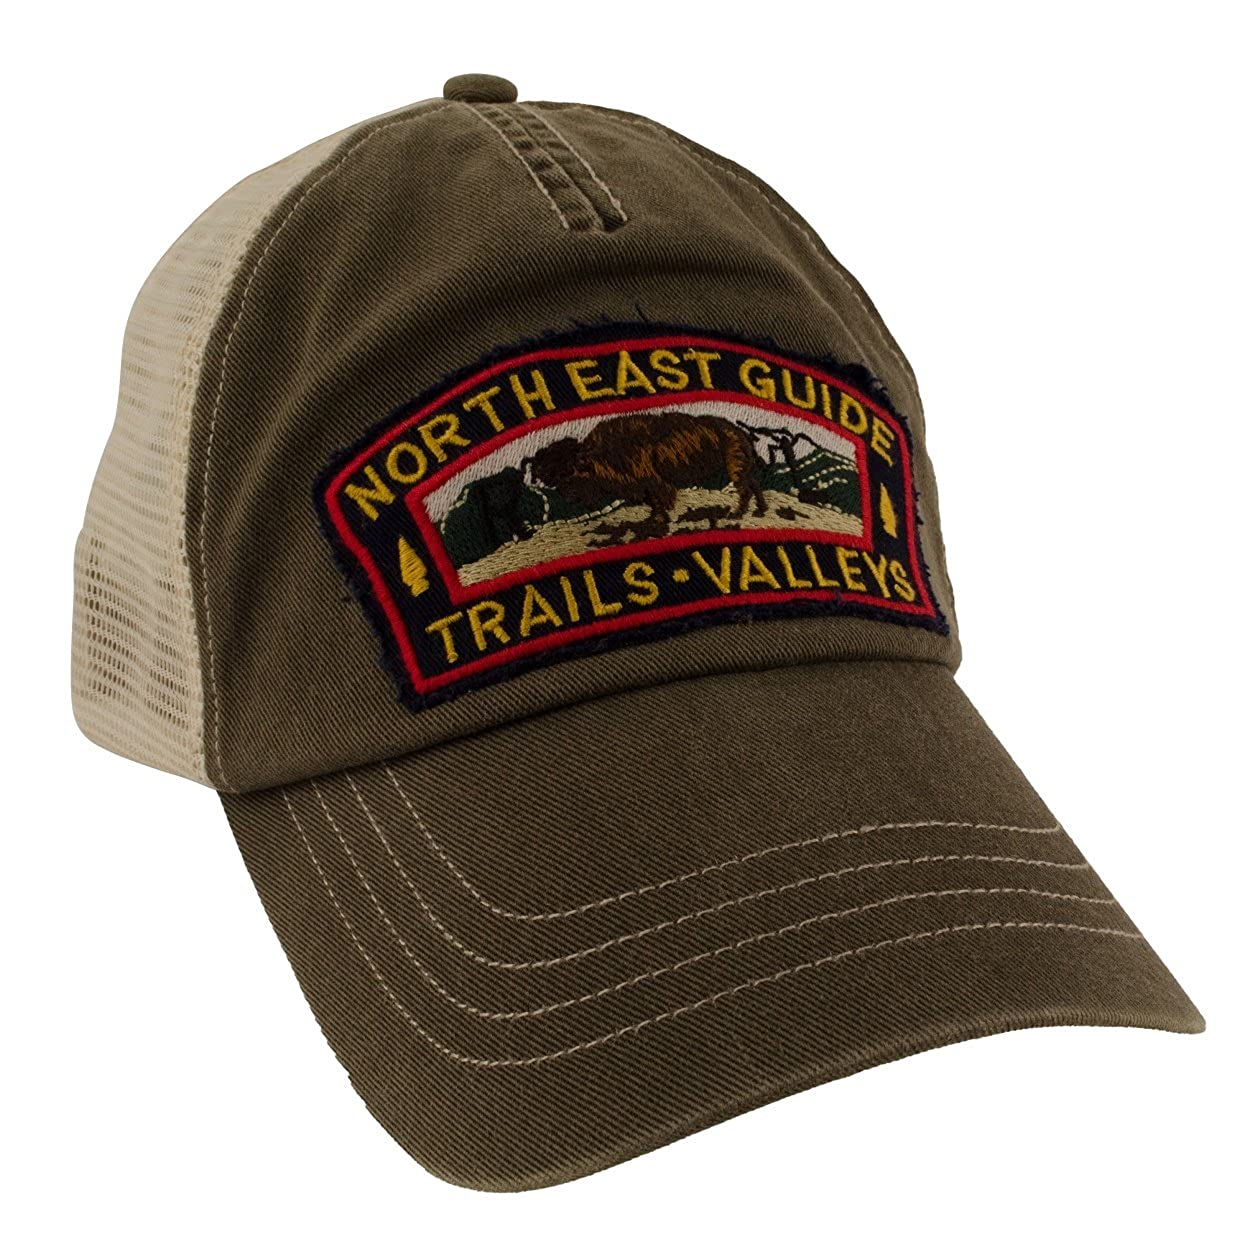 f471ac554 Polo Ralph Lauren Mens Vintage Trucker Baseball Mesh Hat Olive Army ...